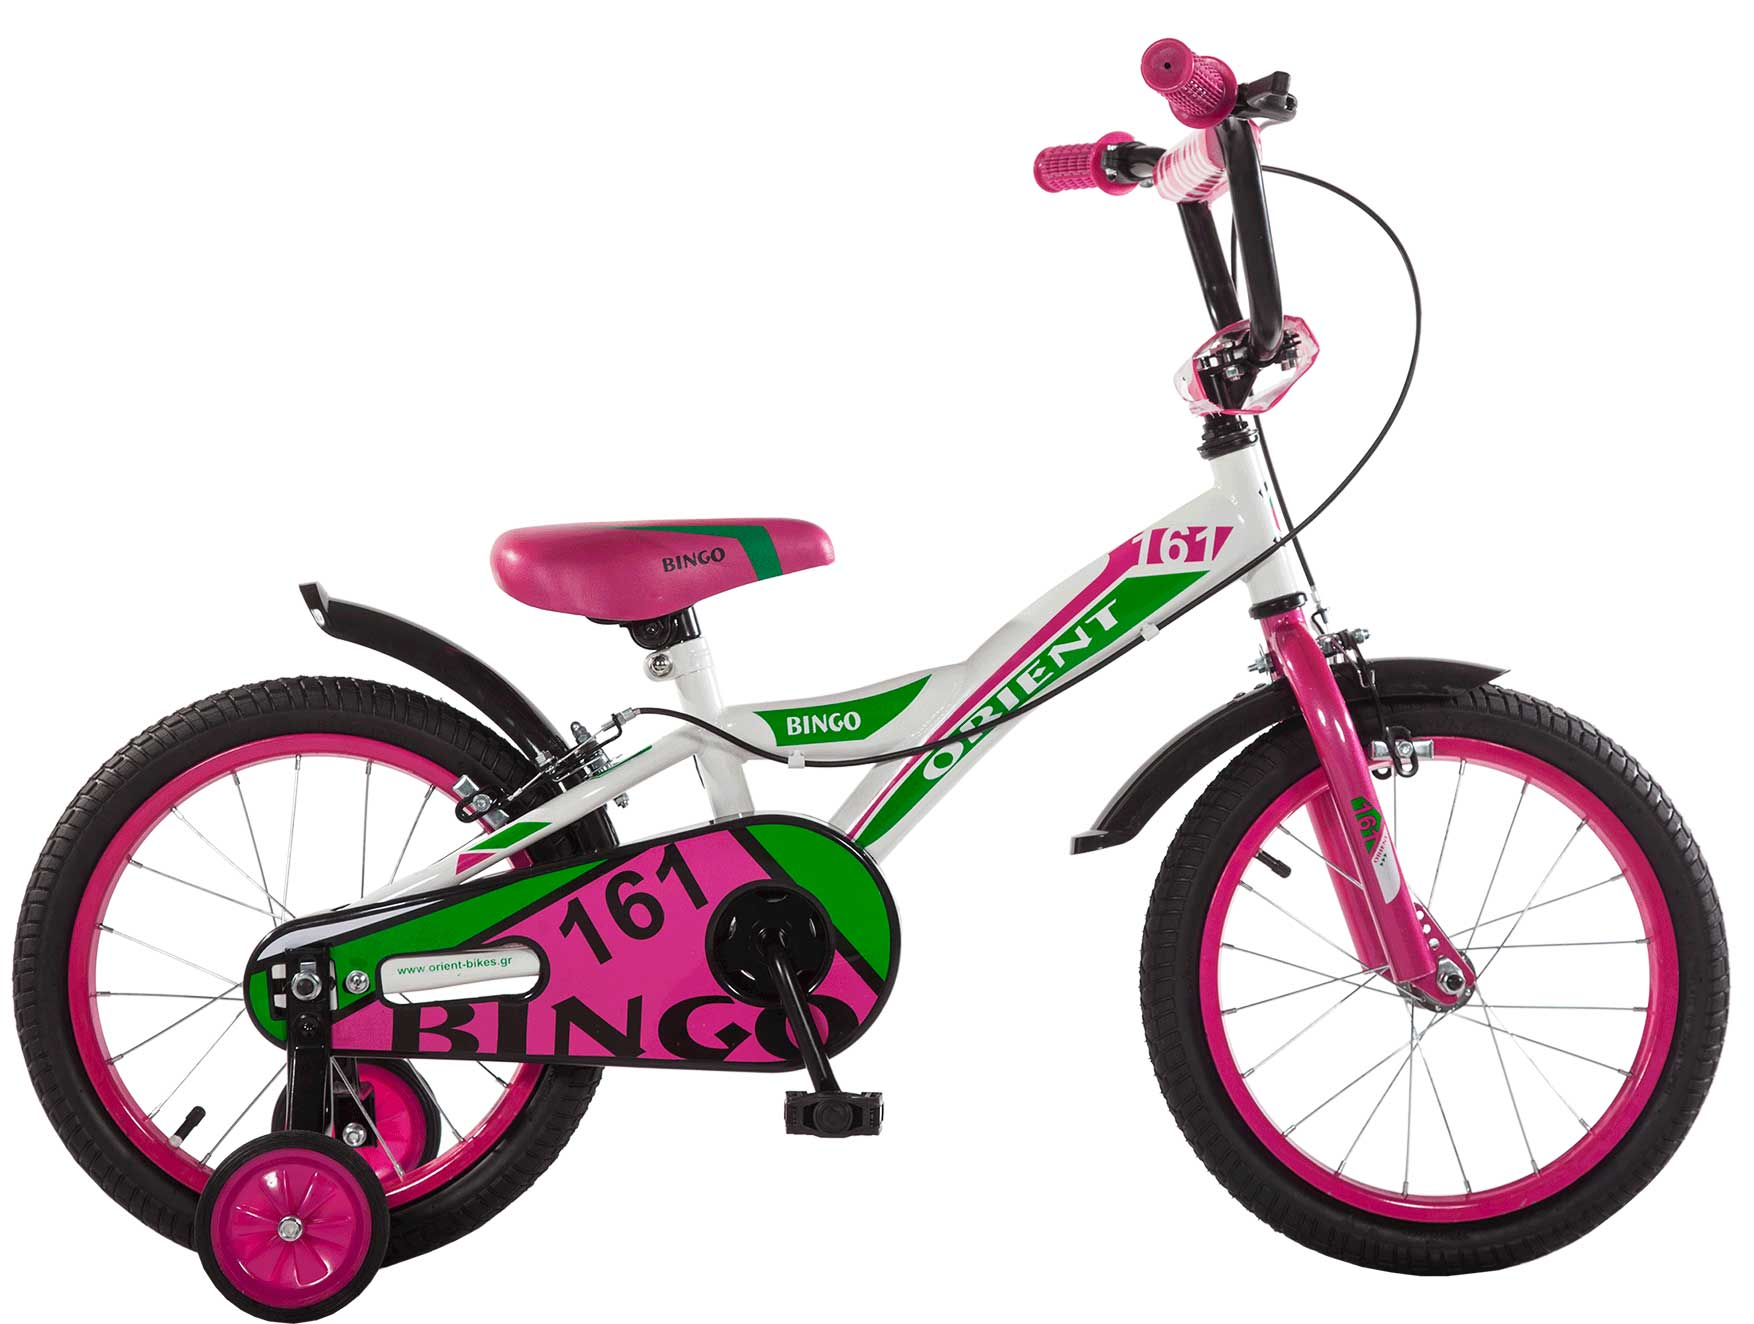 BINGO 16″ bike image